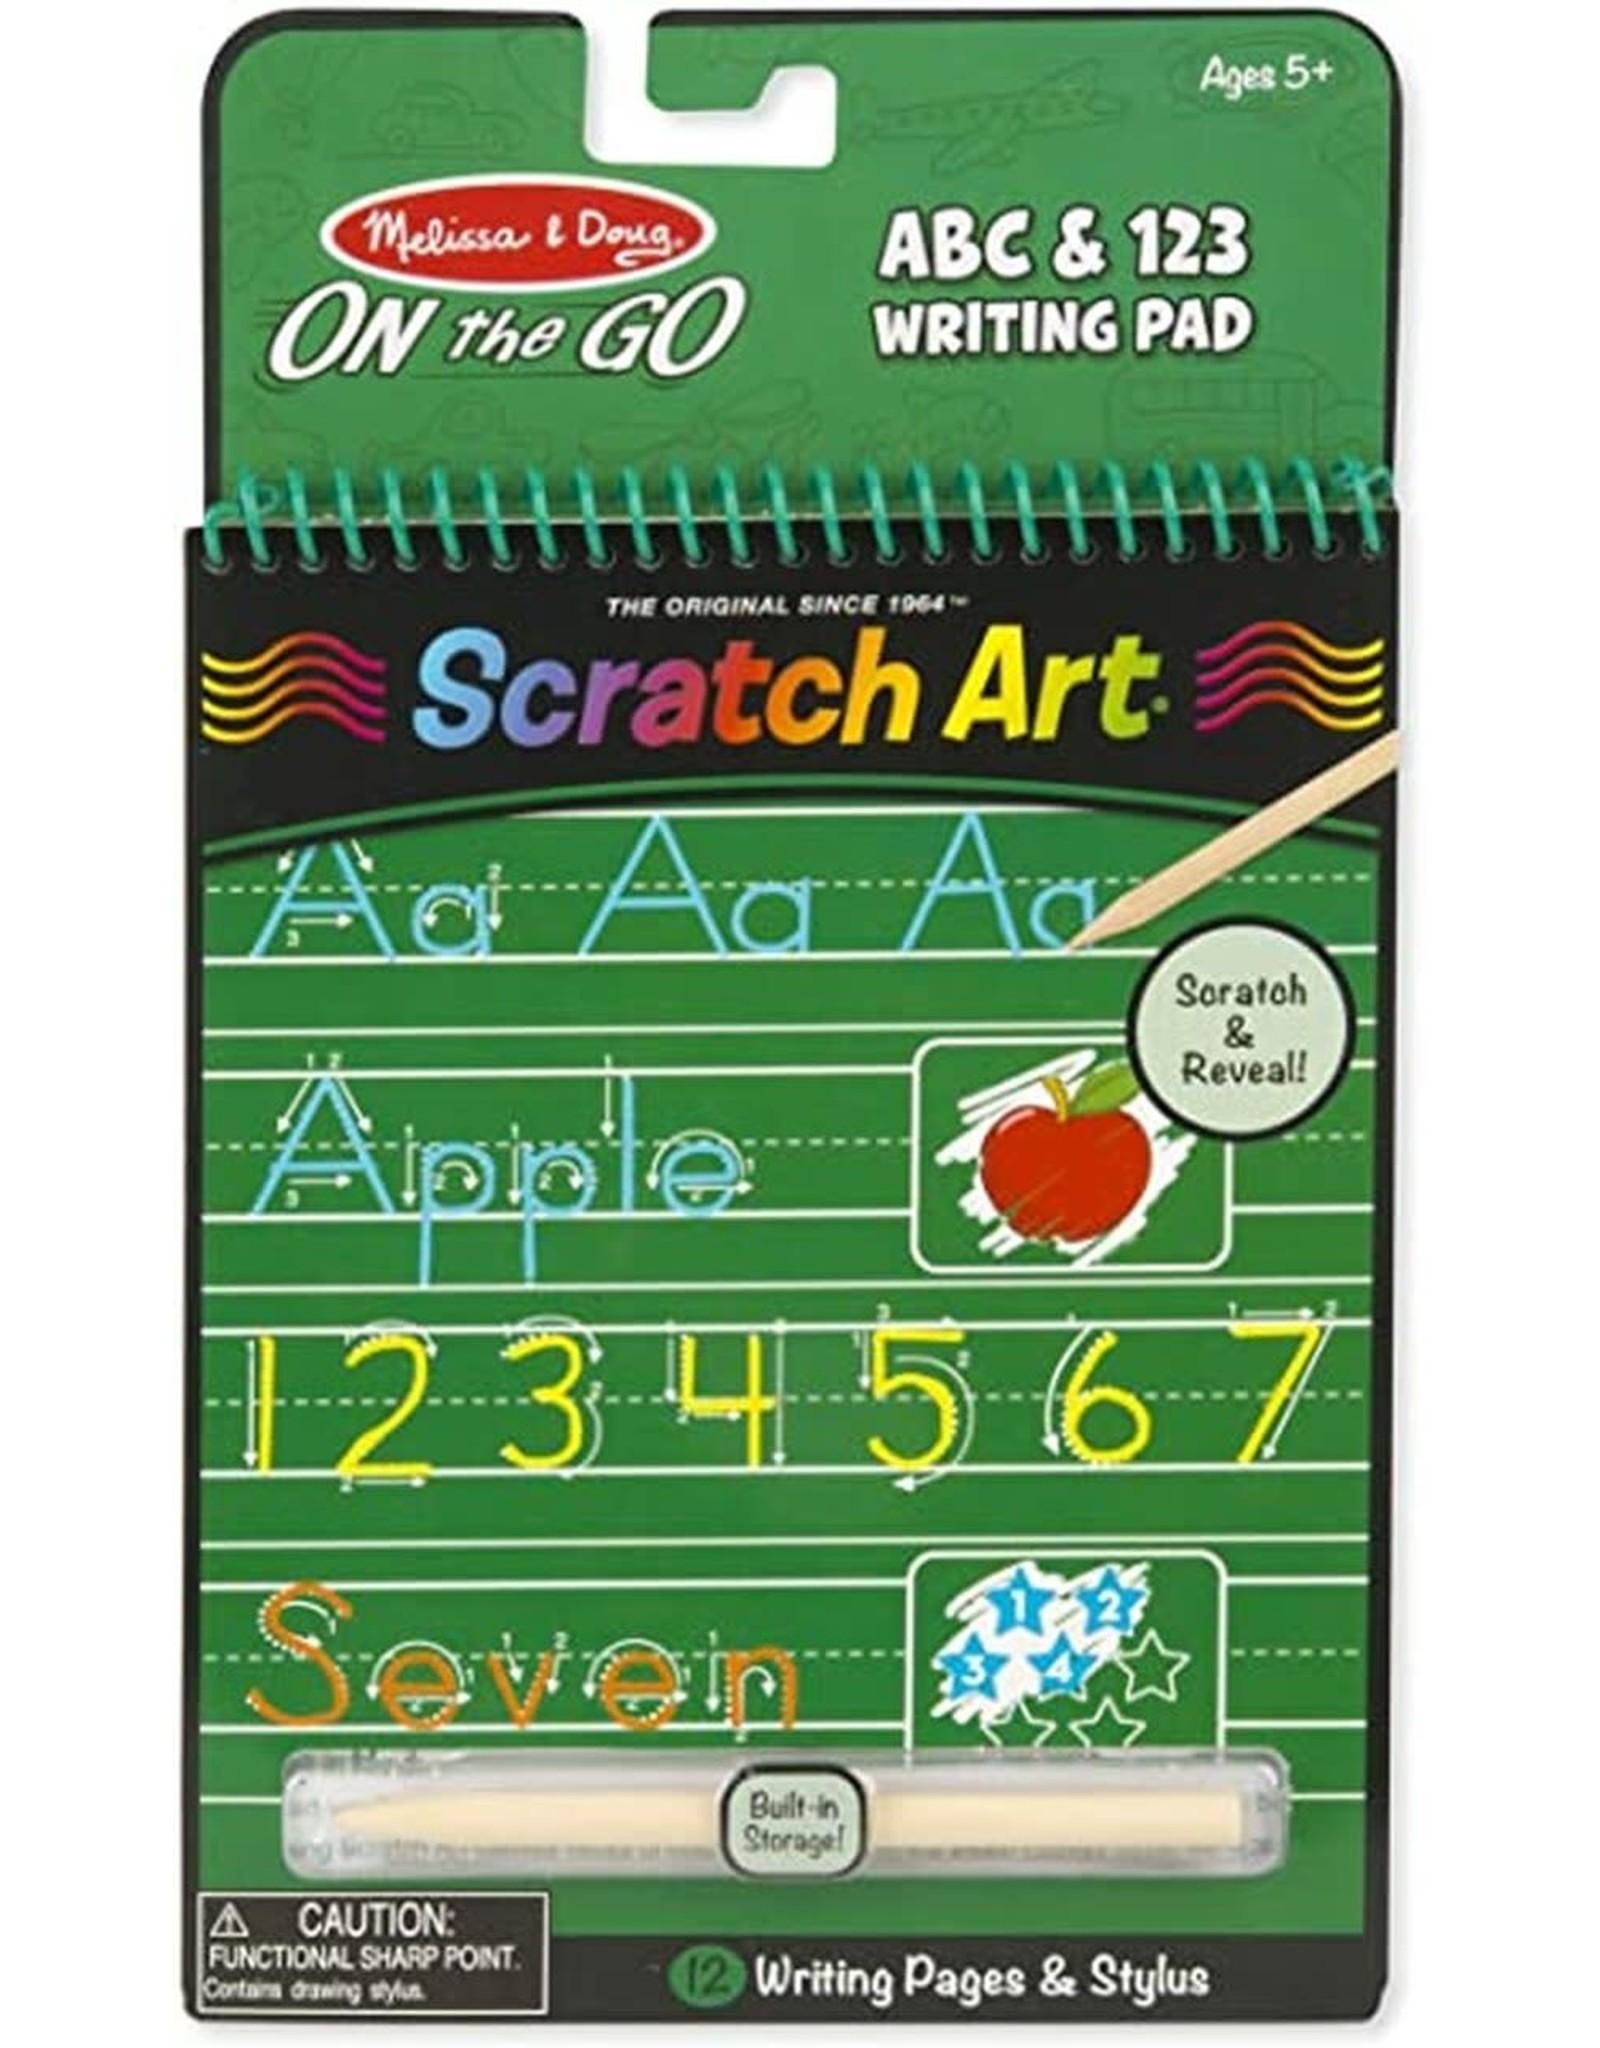 Melissa & Doug M&D - ABC & 123 WRITING PAD #9142